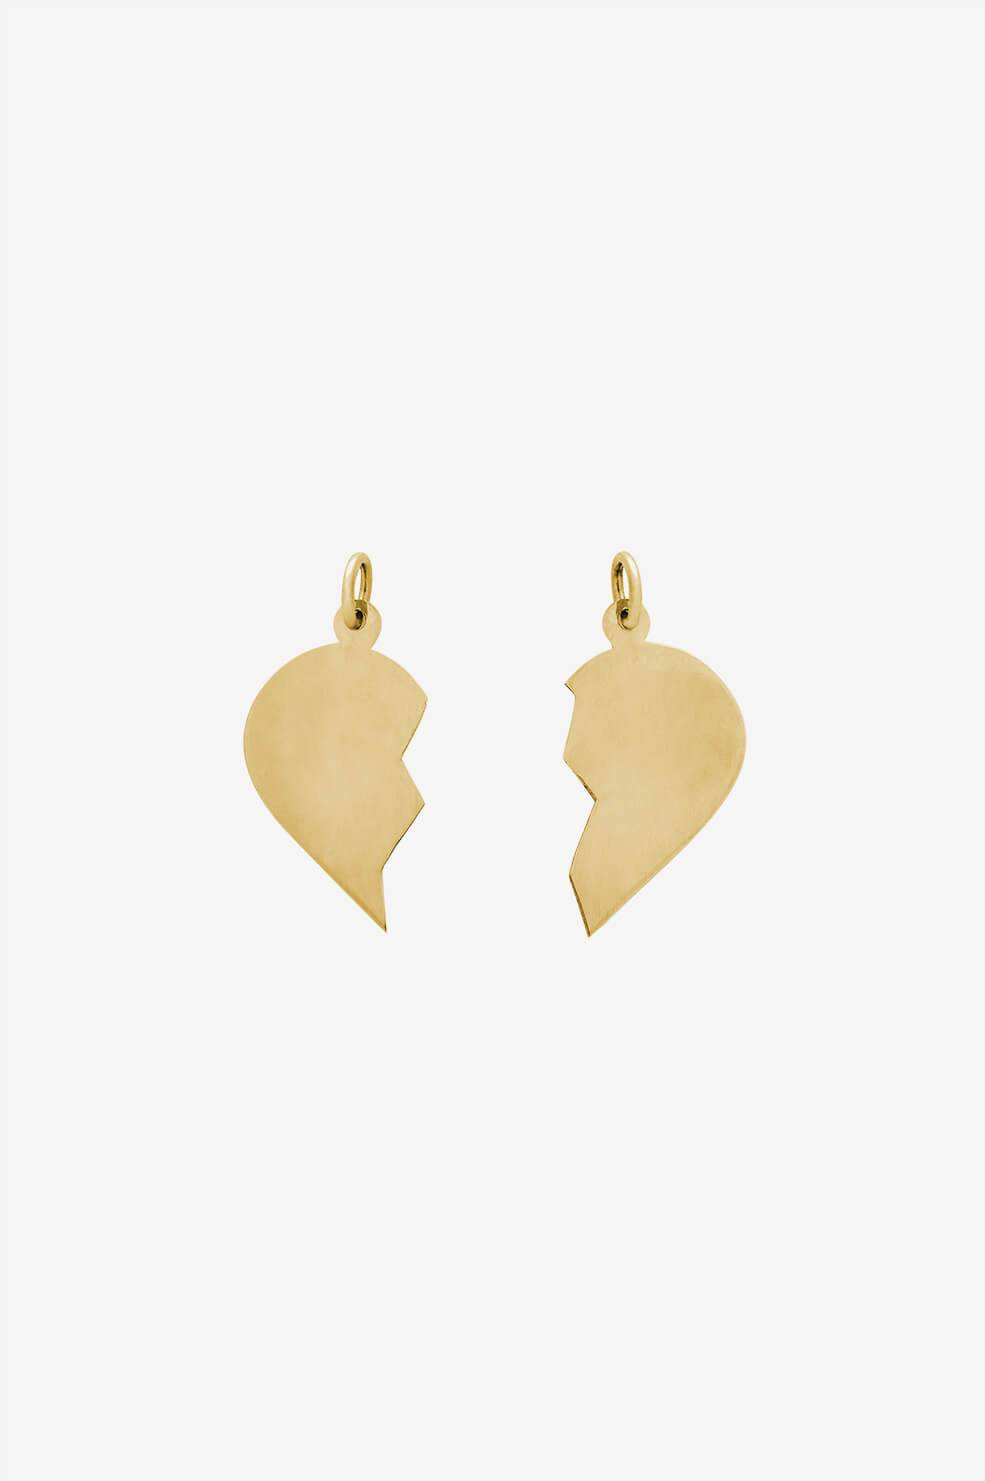 ANINE BING 14k Gold Broken Heart Charm Pendants  - 14k Yellow Gold - Size: One Size